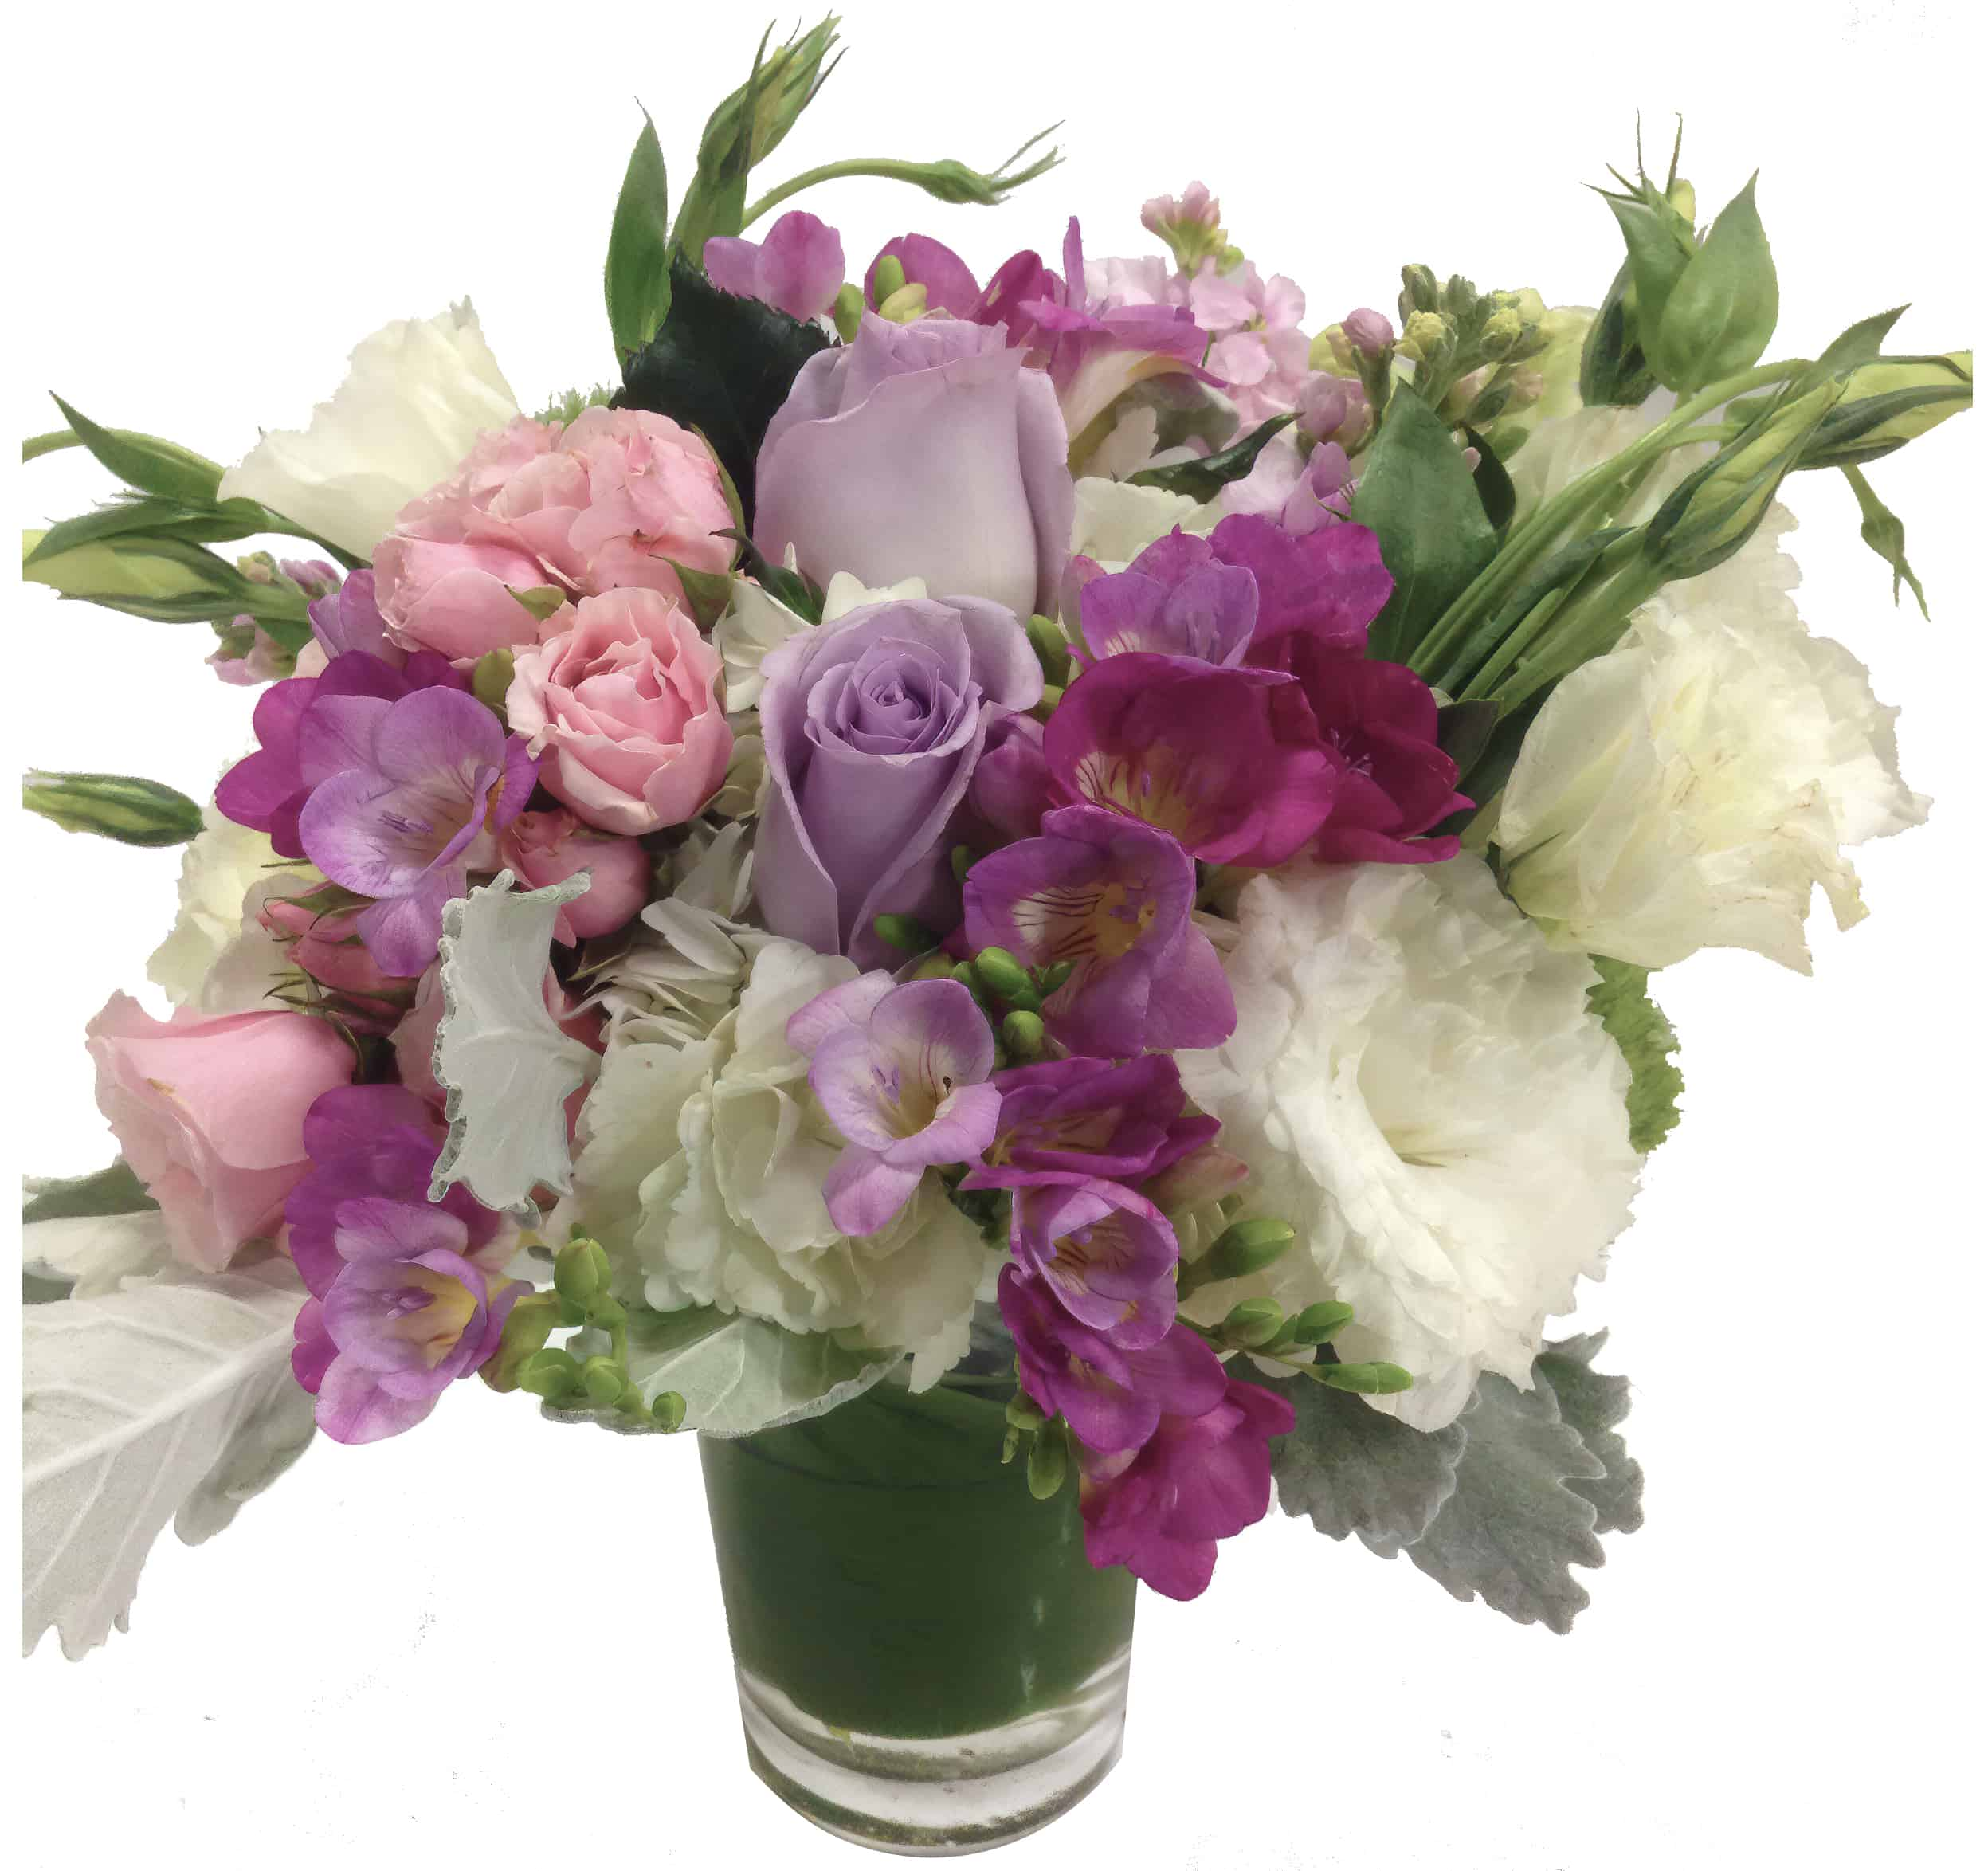 Pastel Whispers Floral Arrangement